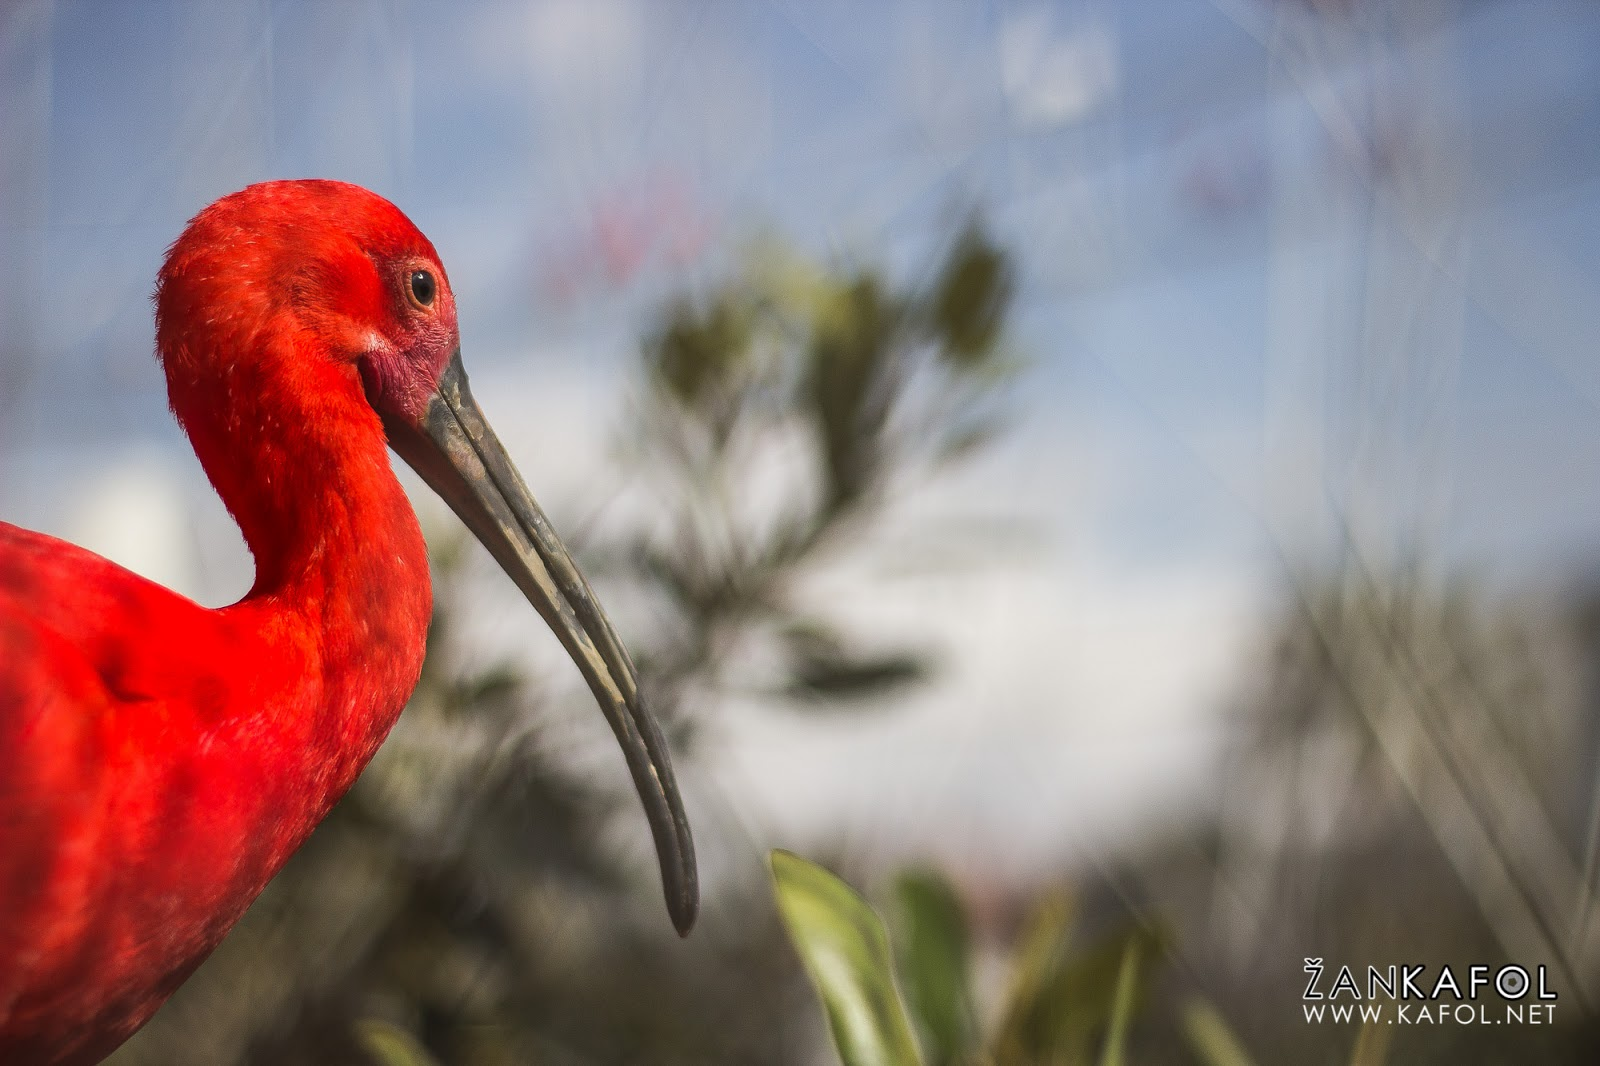 Škrlatni ibis (Eudocimus ruber)